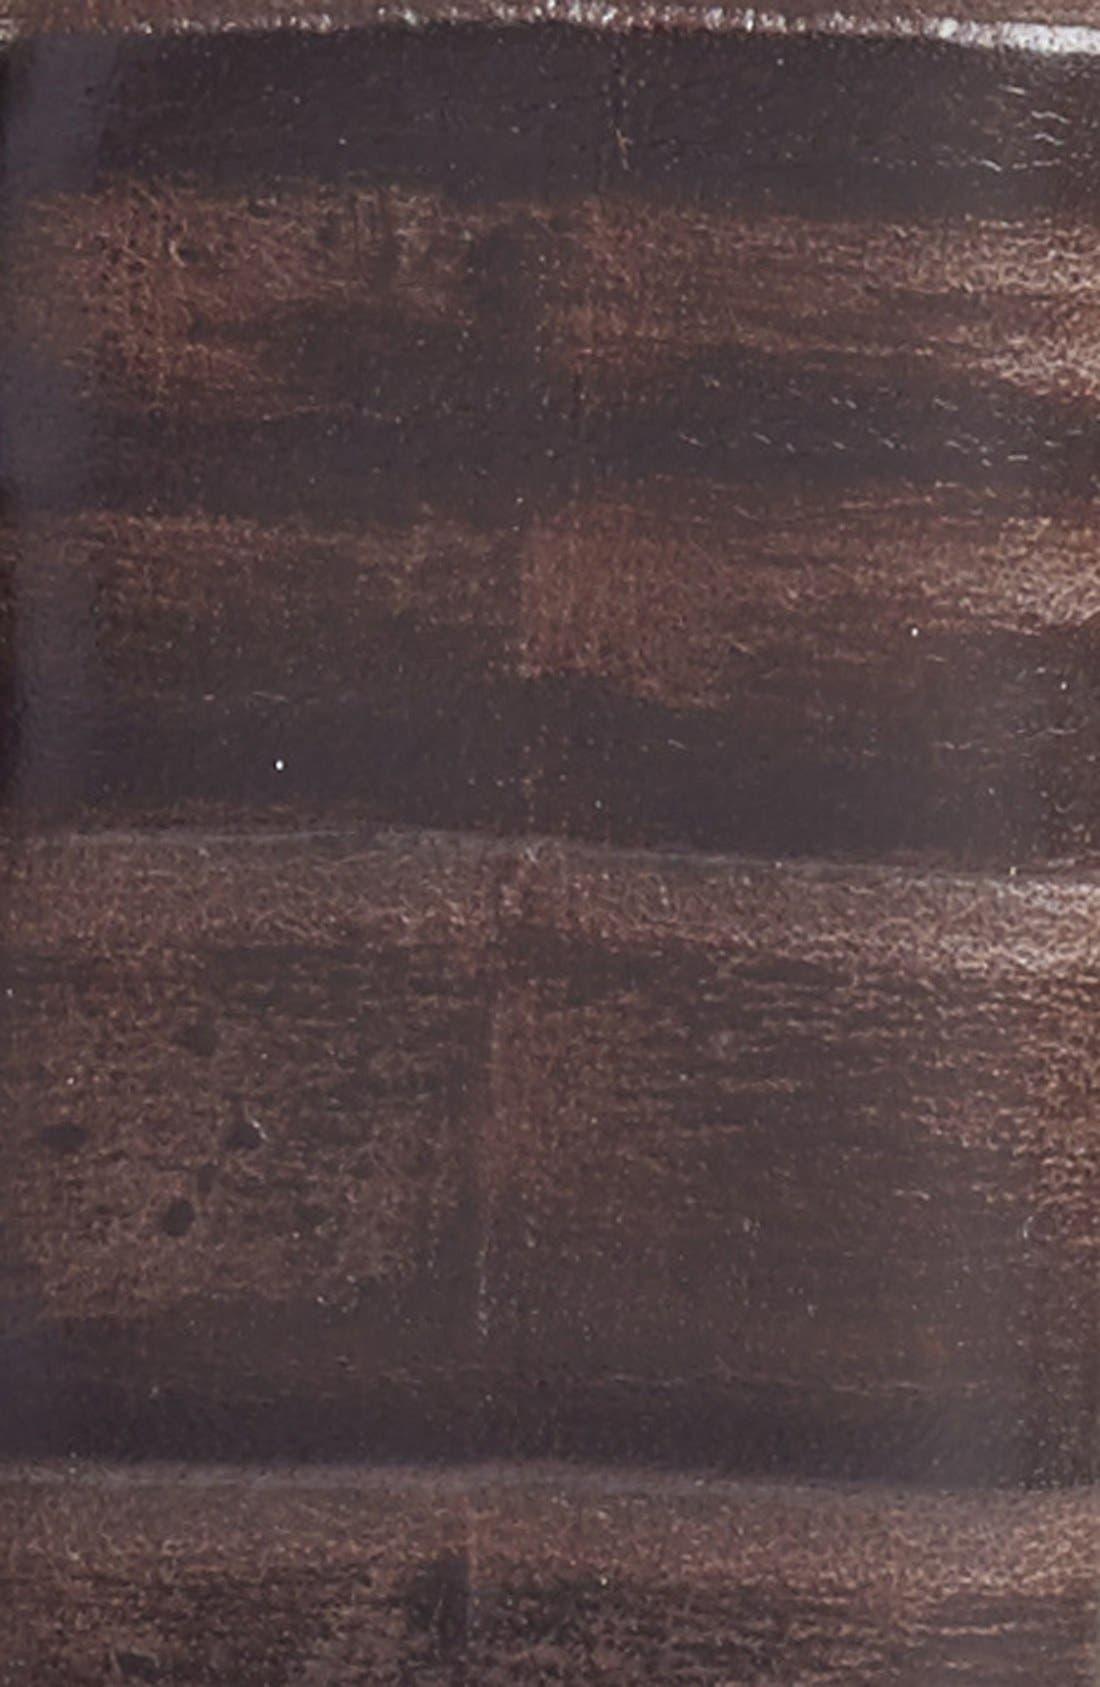 Alternate Image 2  - Torino Belts Ribbed Kipskin Leather Belt